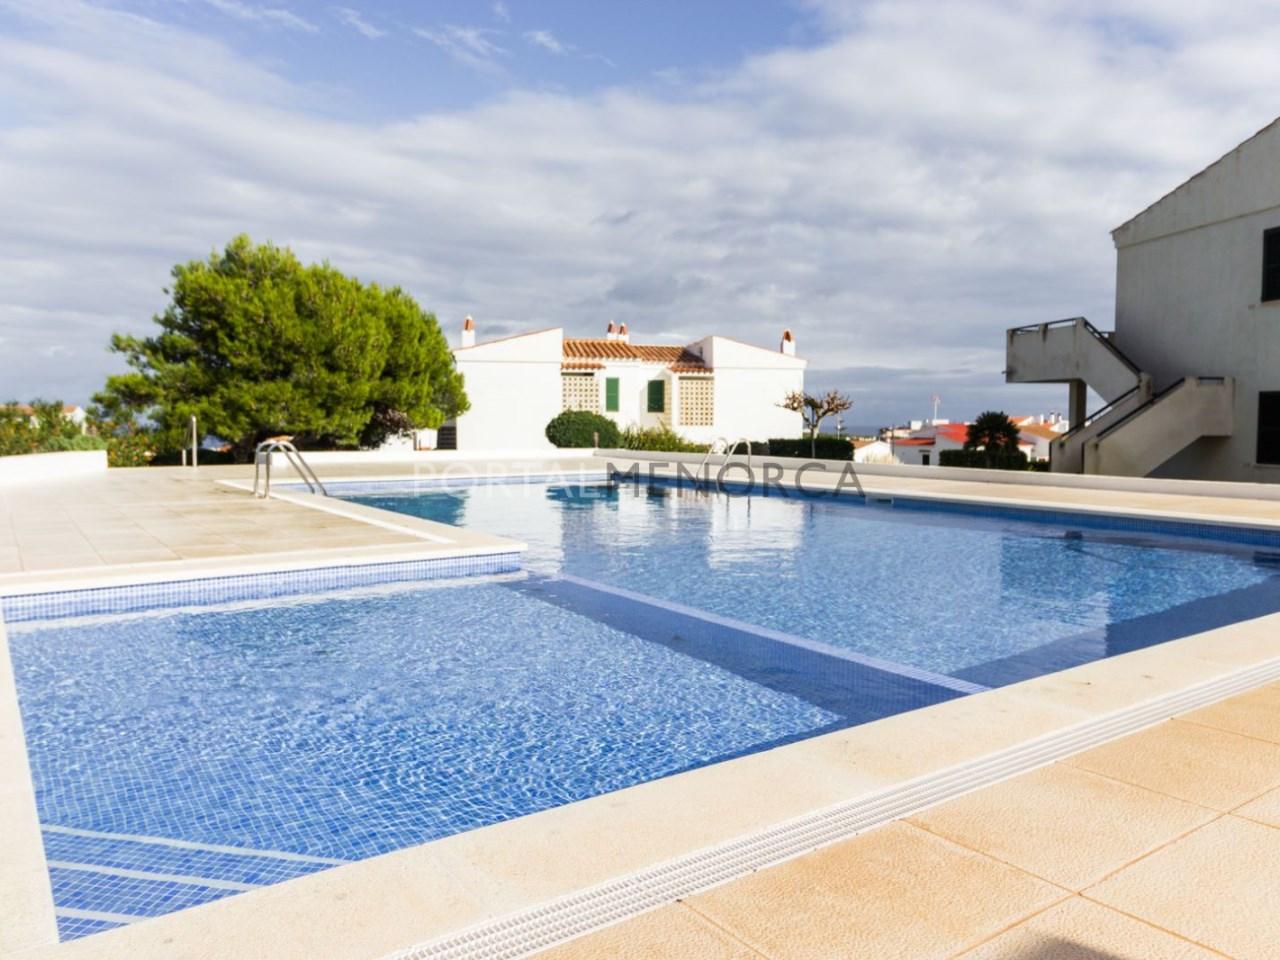 apartamento en venta en Arenal d'en Castell (10 de 11)